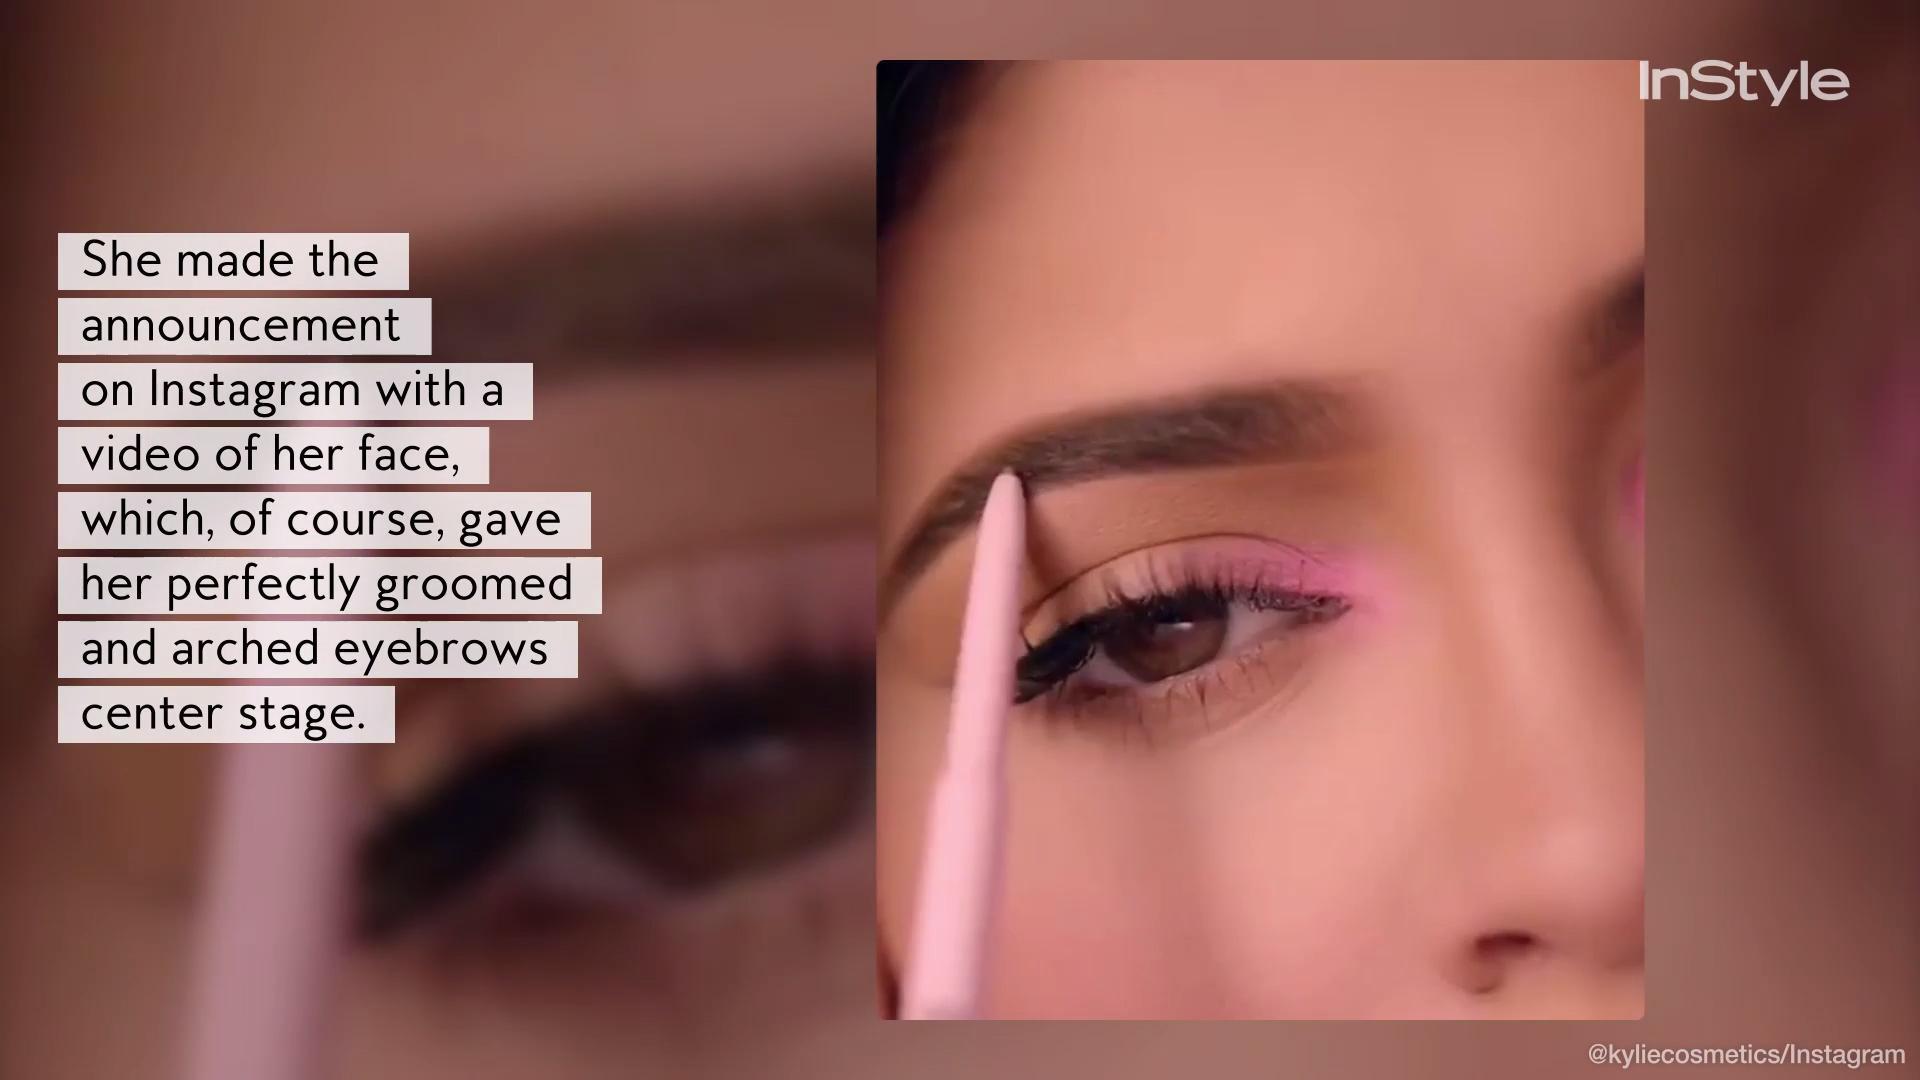 Kylie Jenner and Khloé Kardashian Took Shots and Filmed a Makeup Tutorial